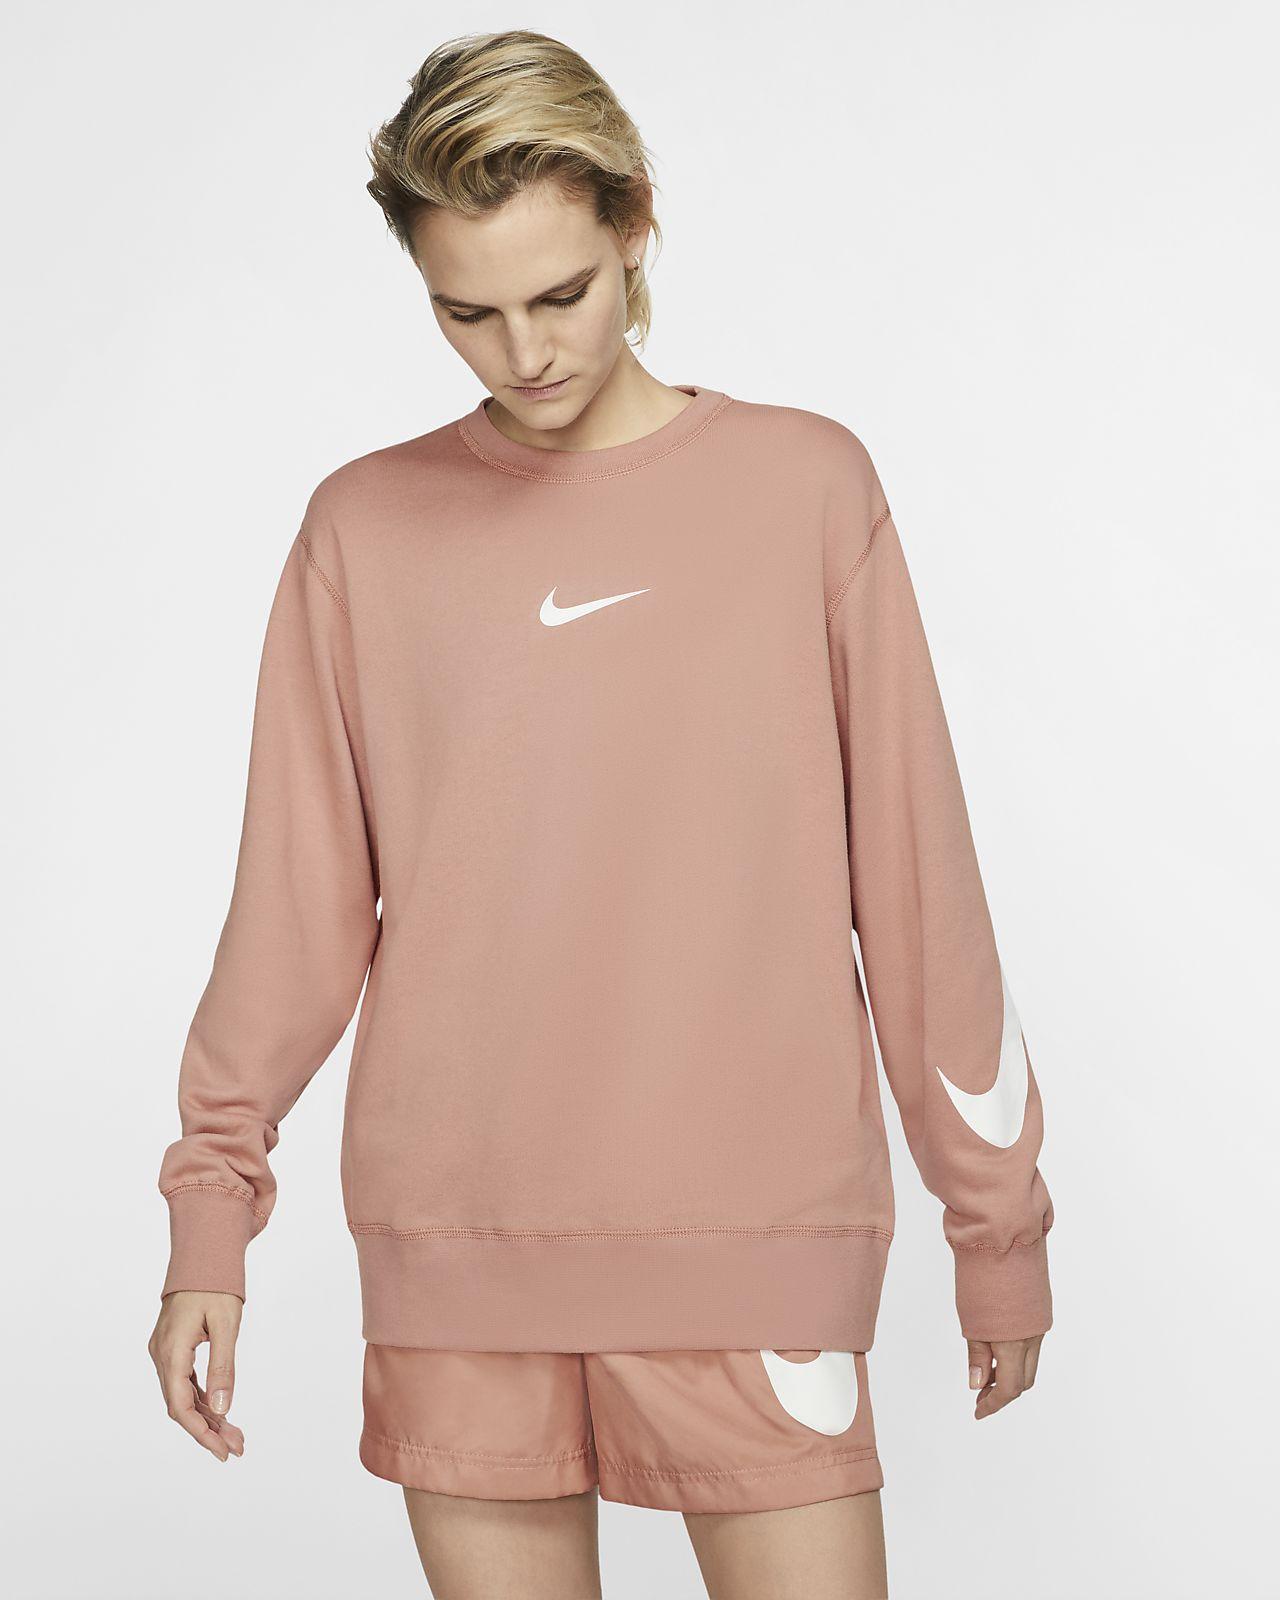 7dea48e3a586 Nike Sportswear Swoosh Women s Long-Sleeve French Terry Crew. Nike ...